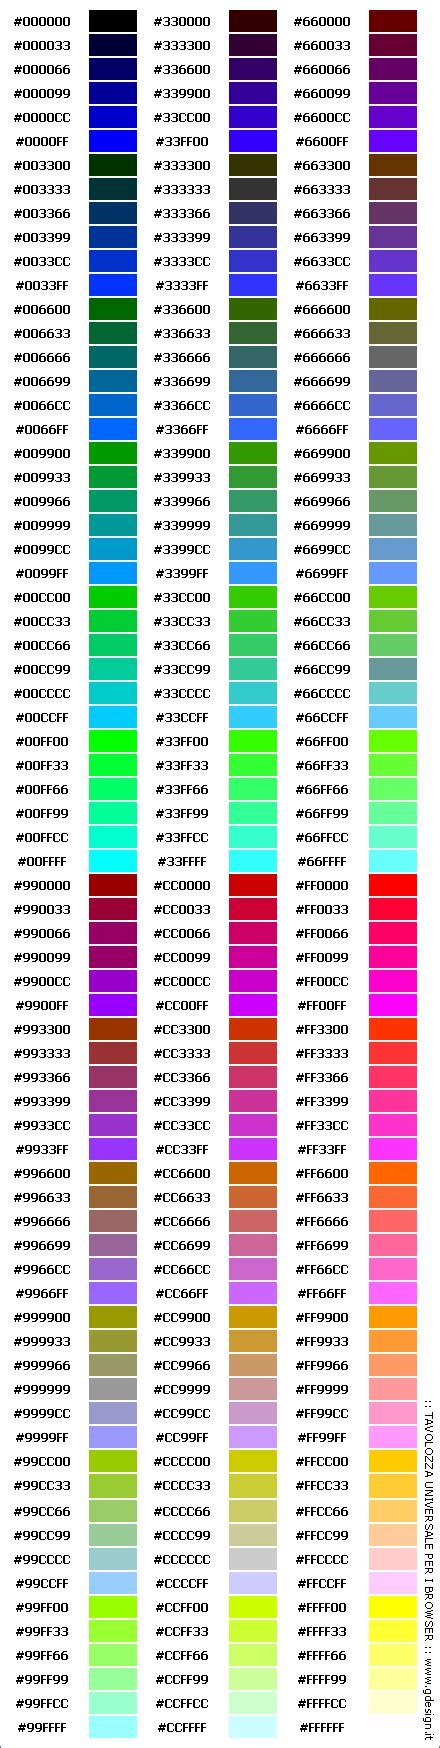 tavola colori html classe terza a ls osa 2014 2015